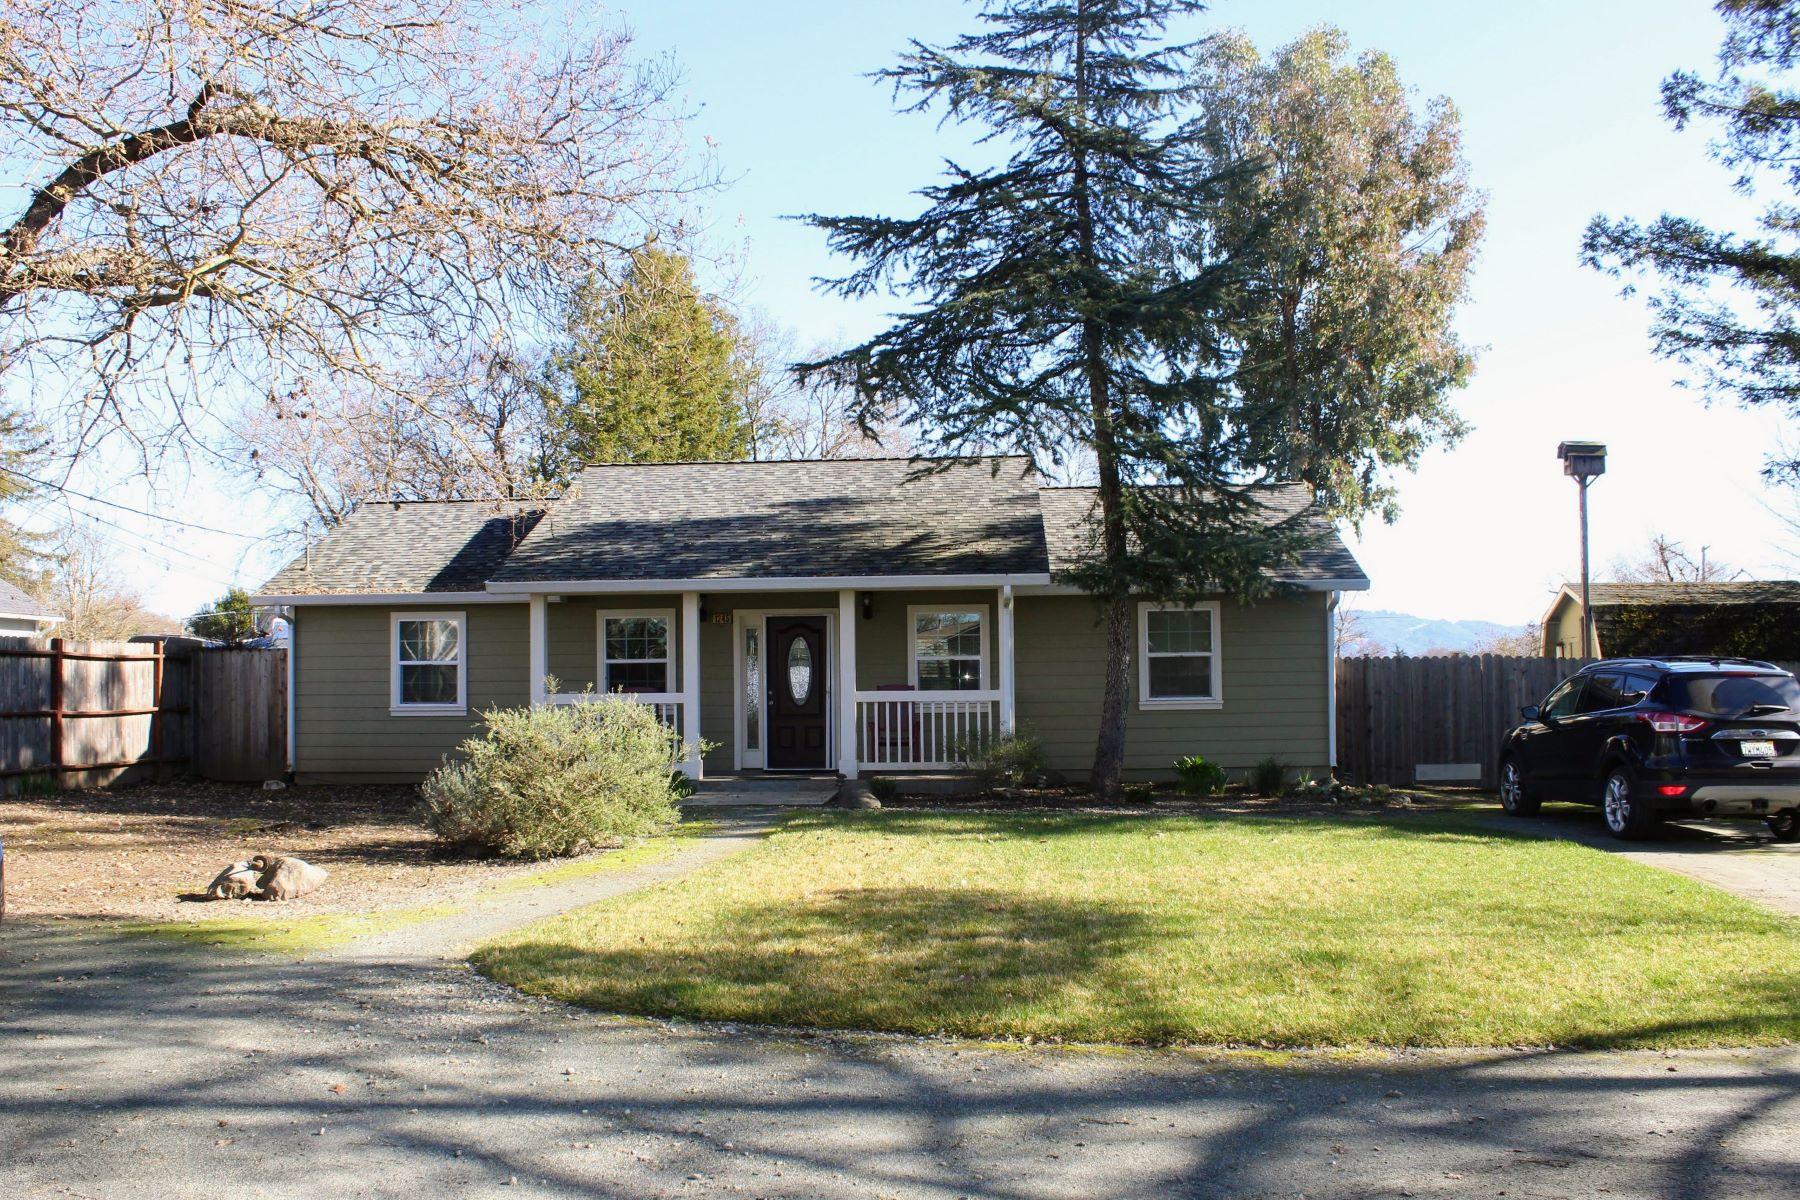 Single Family Homes for Sale at Hidden Jewel 1245 Eva Avenue Santa Rosa, California 95407 United States